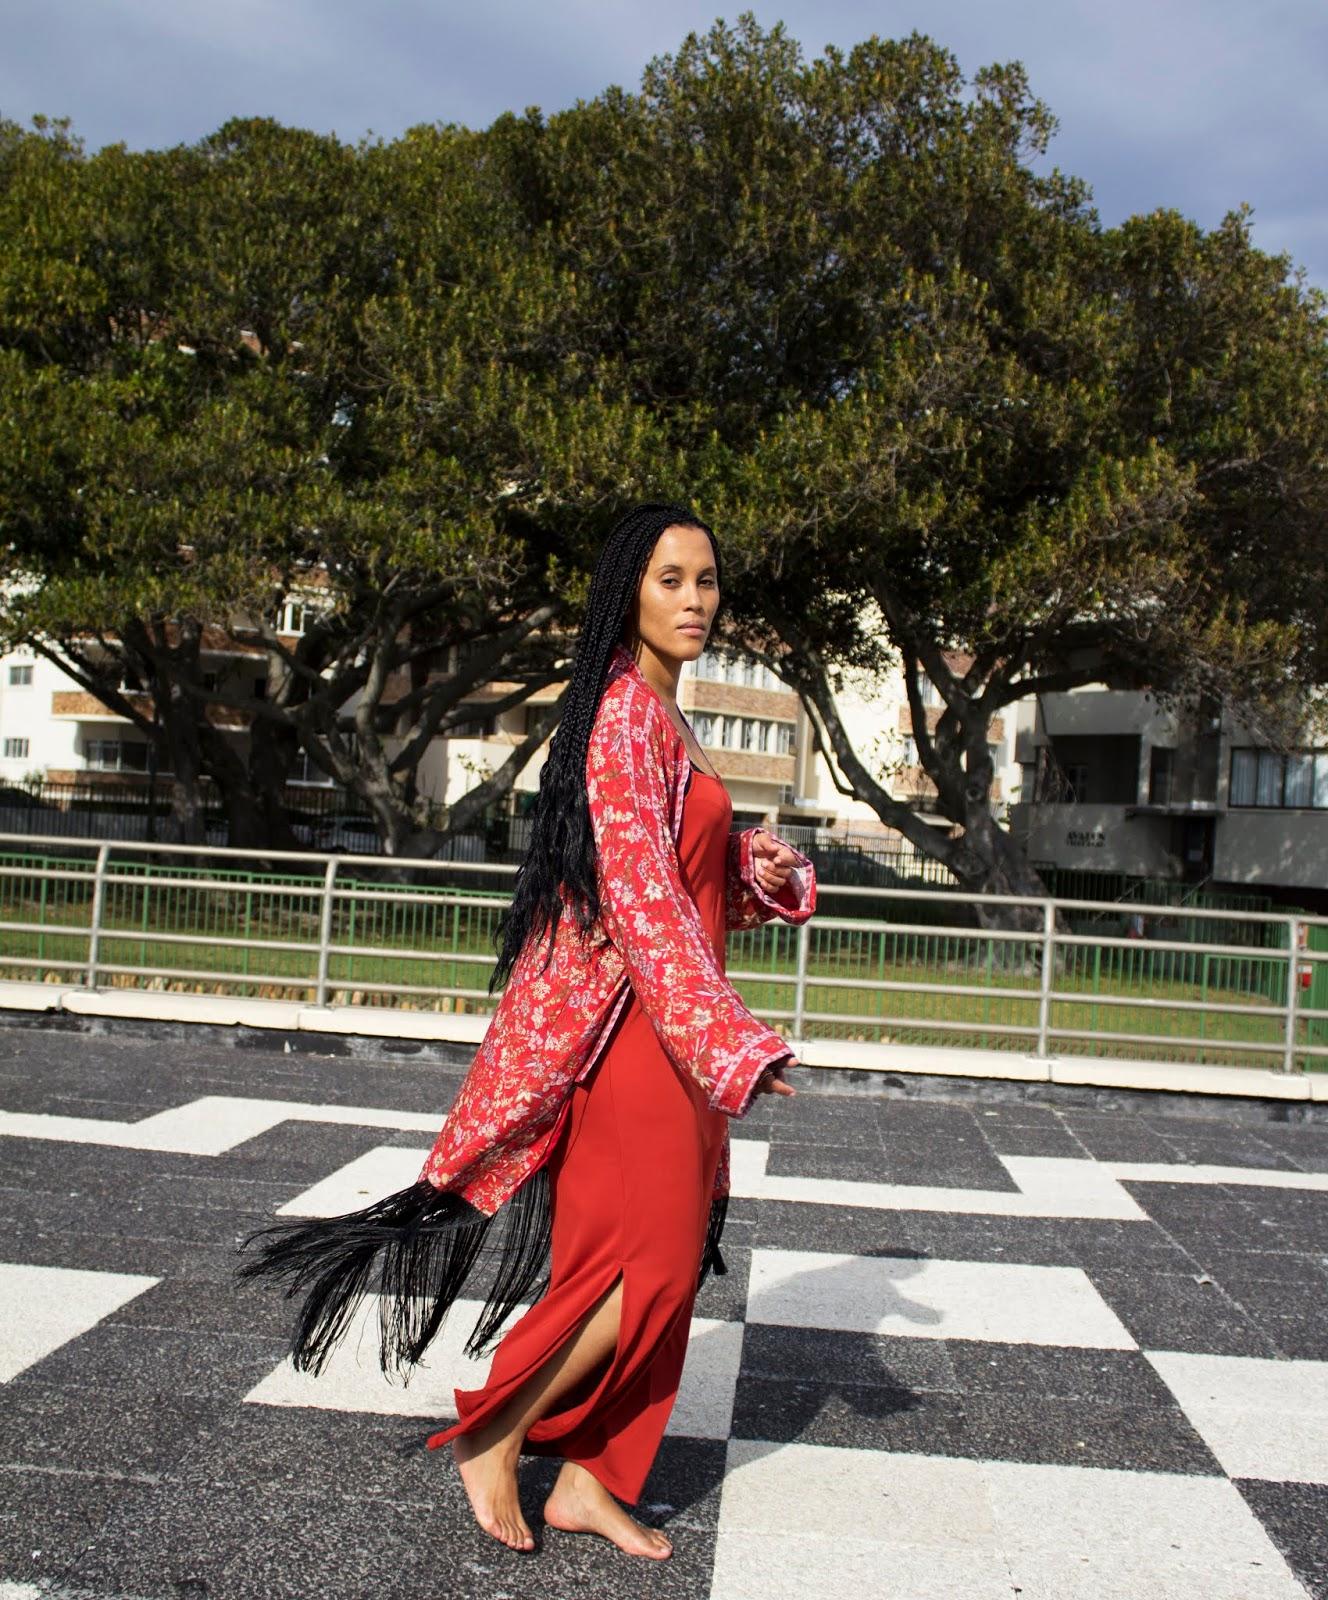 Liezel-Esquire-fringe-kimono